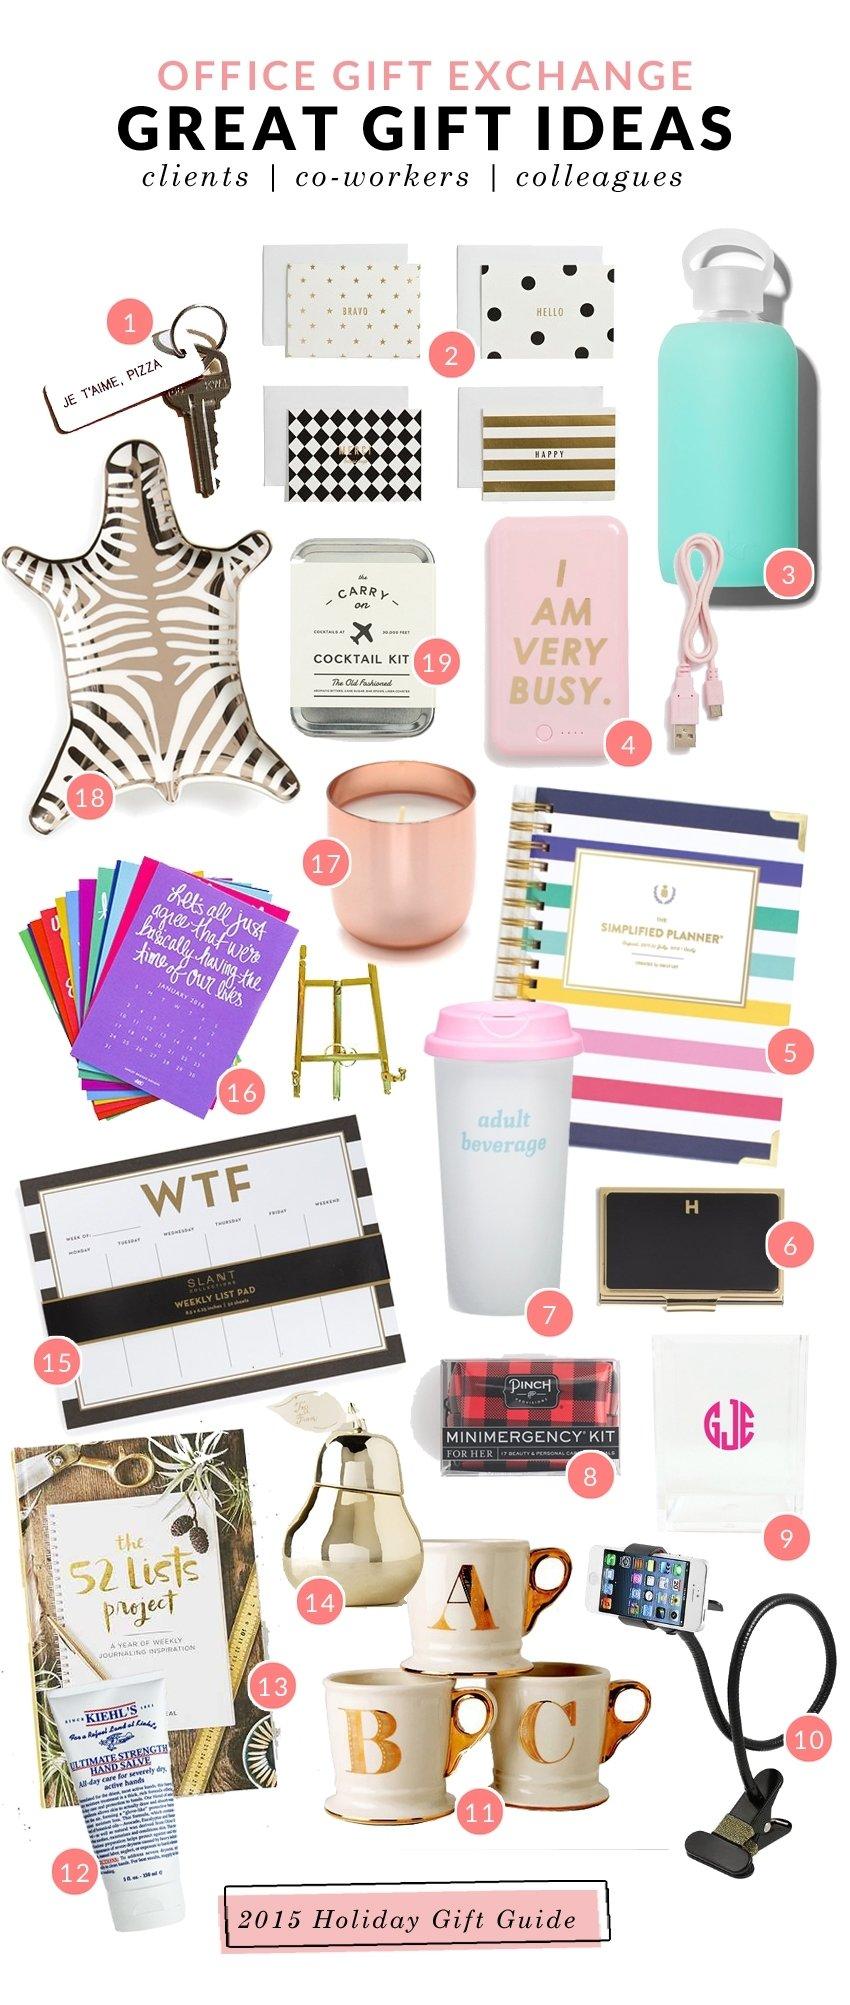 10 Fashionable Secret Santa Gift Exchange Ideas great secret santa gift ideas for co workers or clients 2